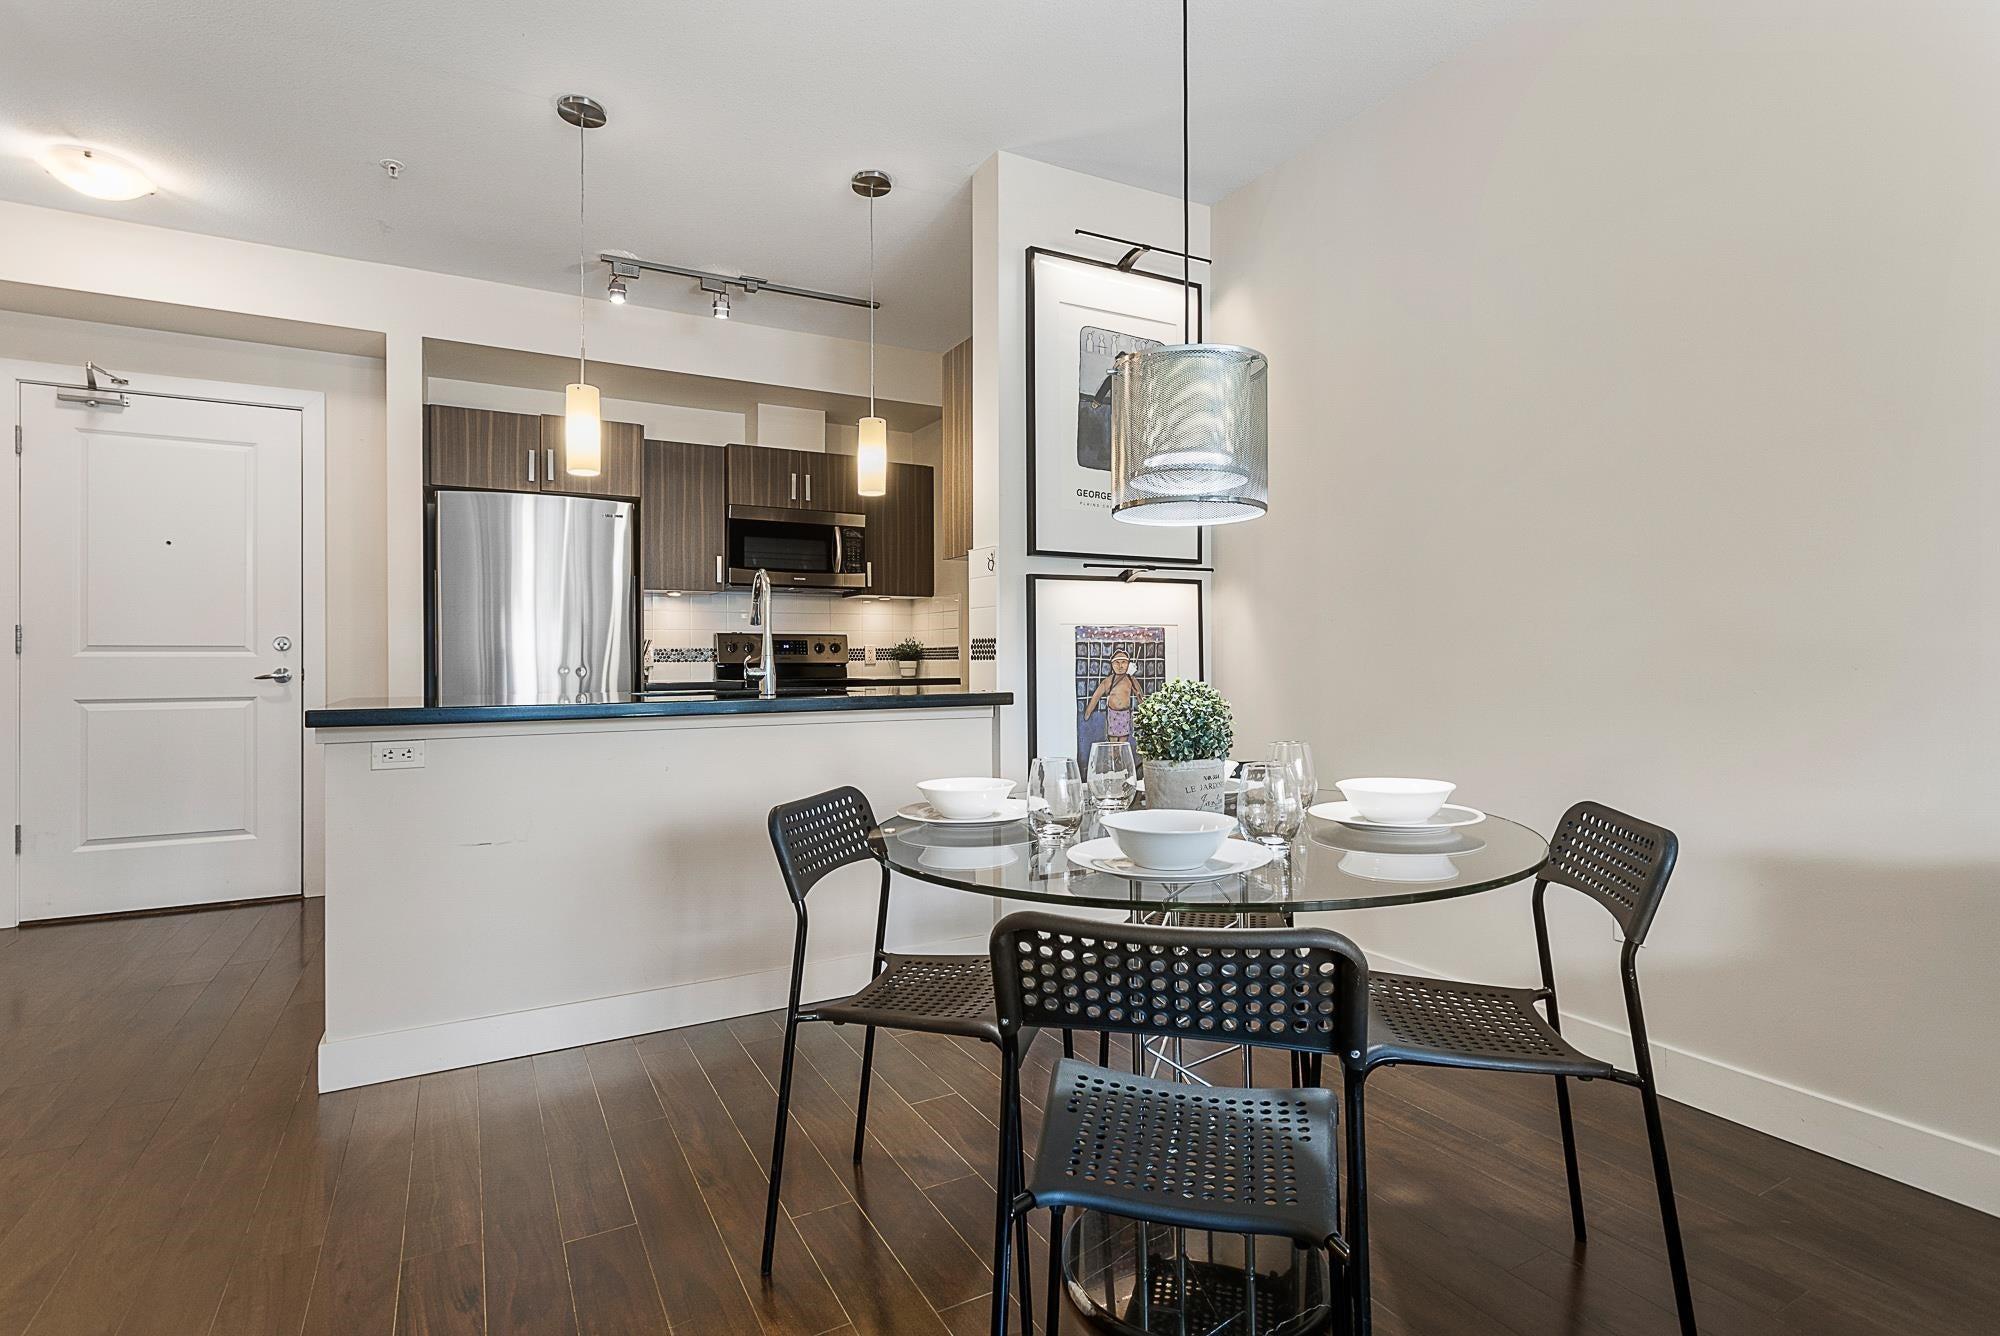 114 20219 54A AVENUE - Langley City Apartment/Condo for sale, 1 Bedroom (R2616172) - #11